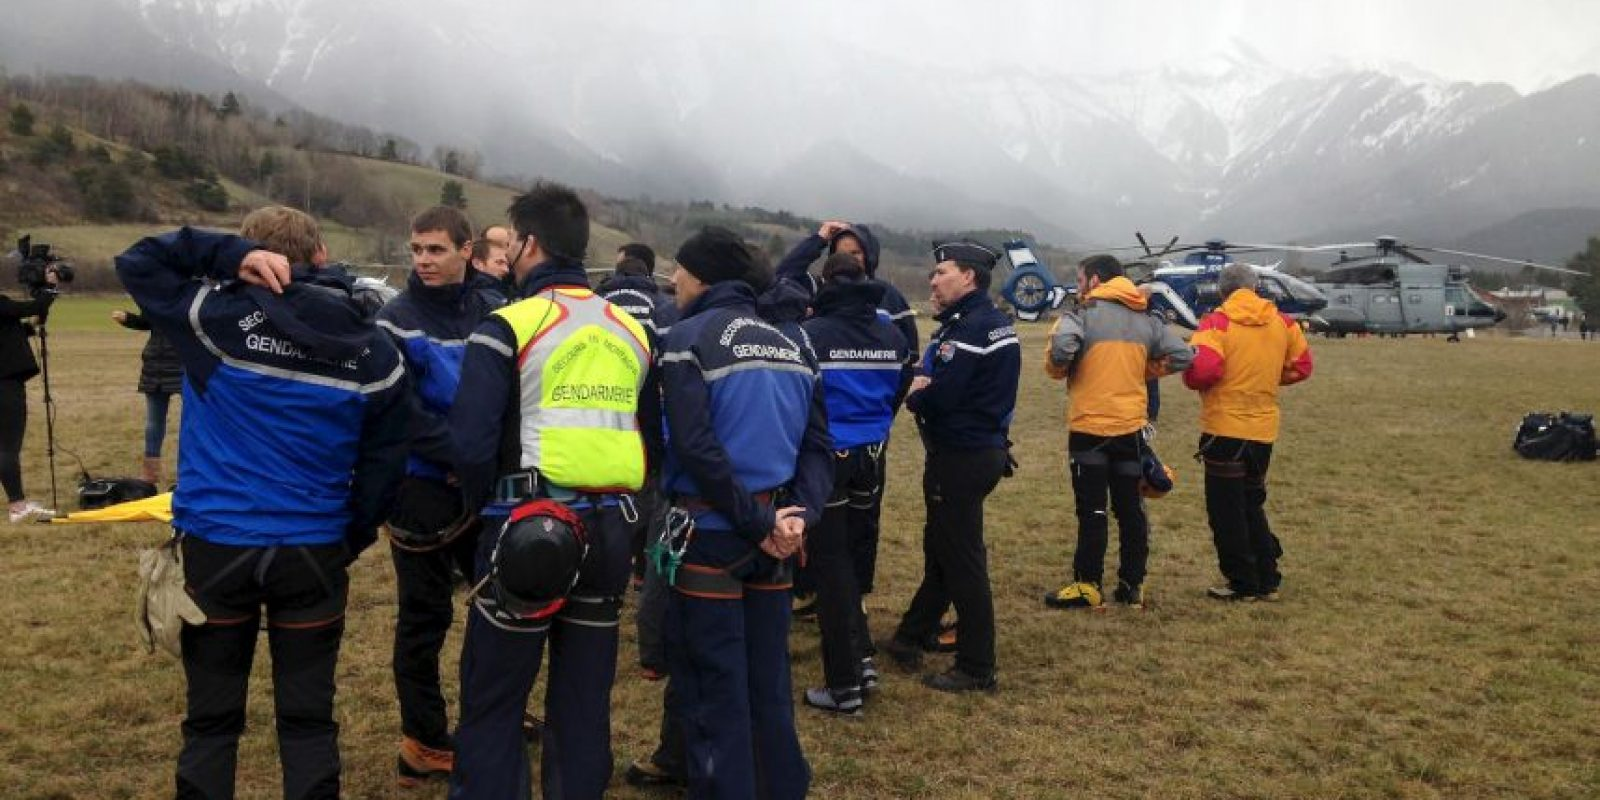 Equipos de rescate en los Alpes franceses Foto:Getty Images